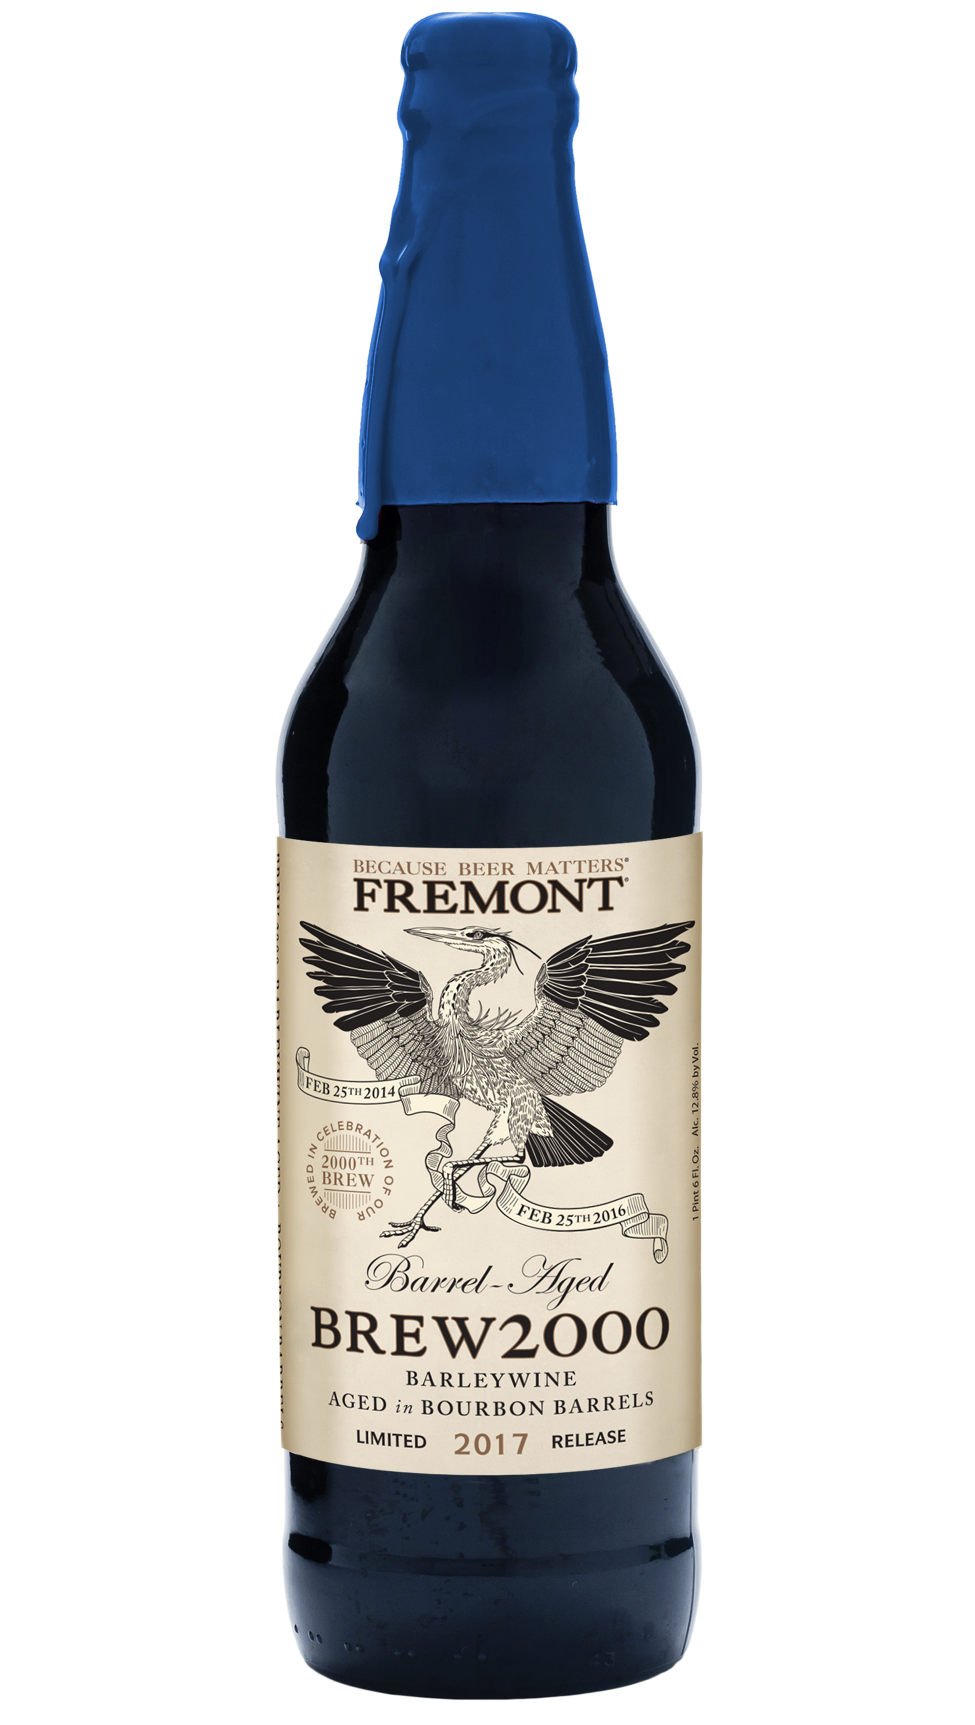 Brew 2000